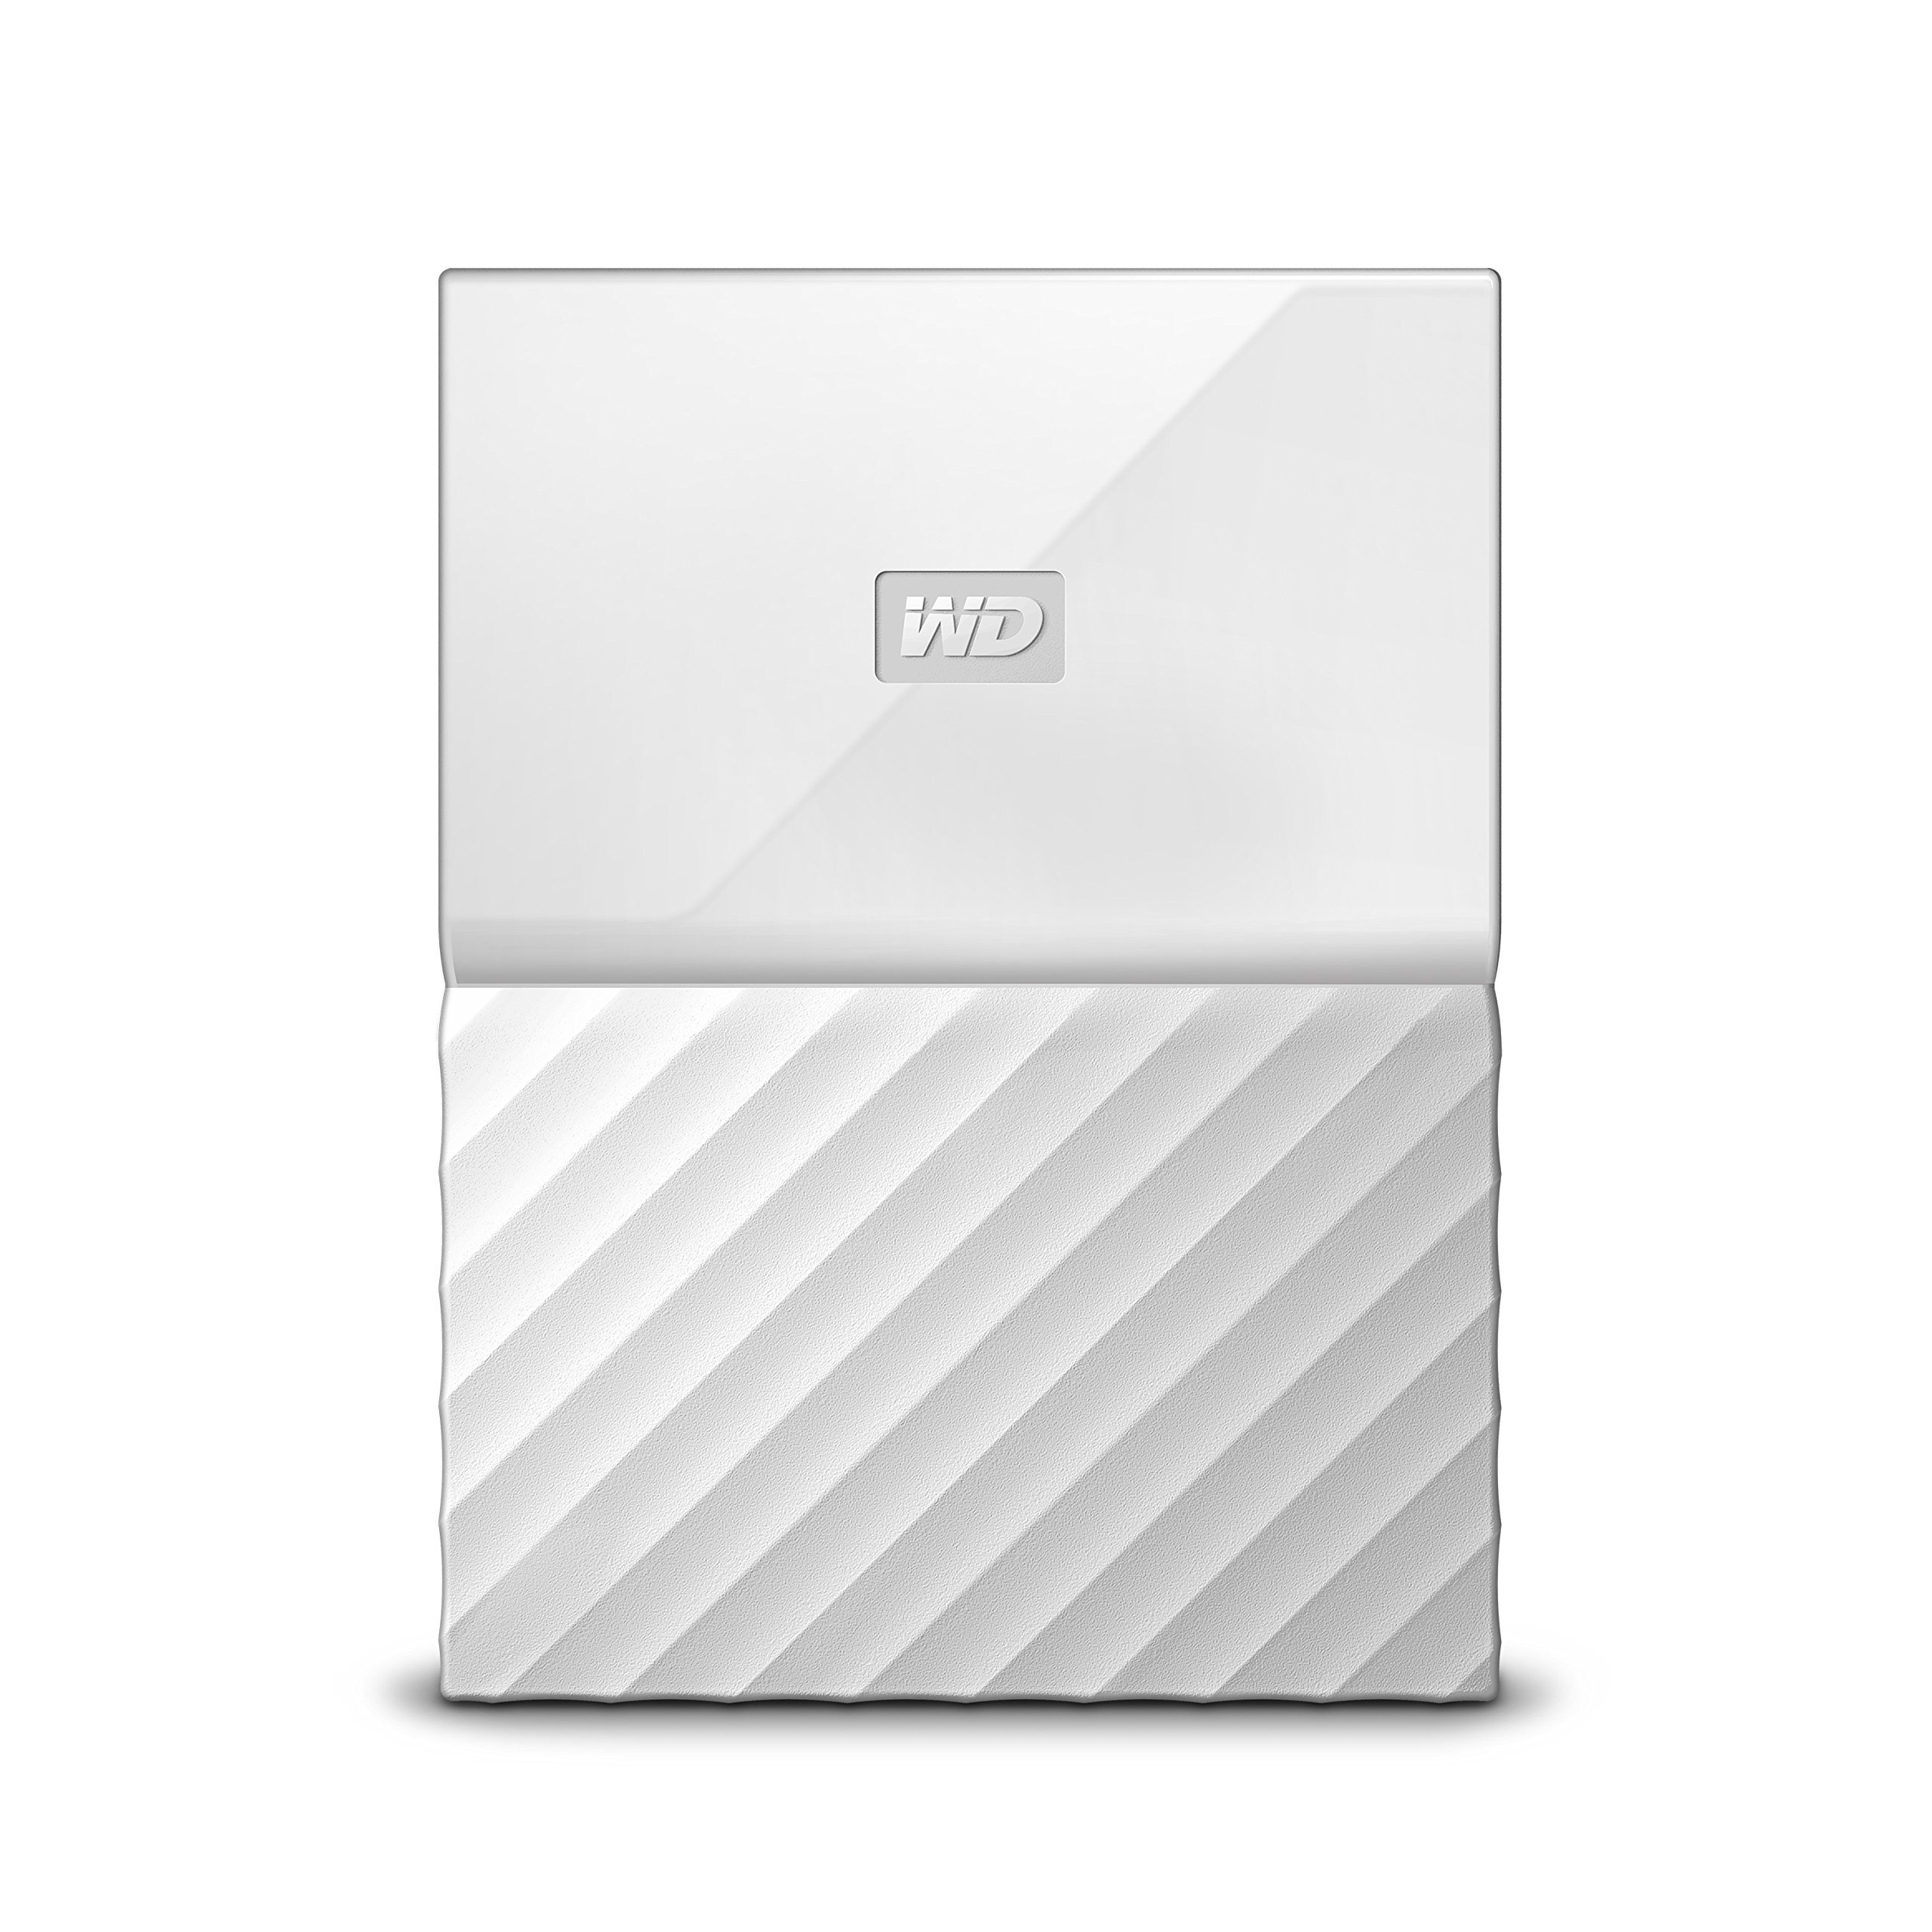 WD 1TB White My Passport Portable External Hard Drive - USB 3.0 - WDBYNN0010BWT-WESN (Certified Refurbished) by Western Digital